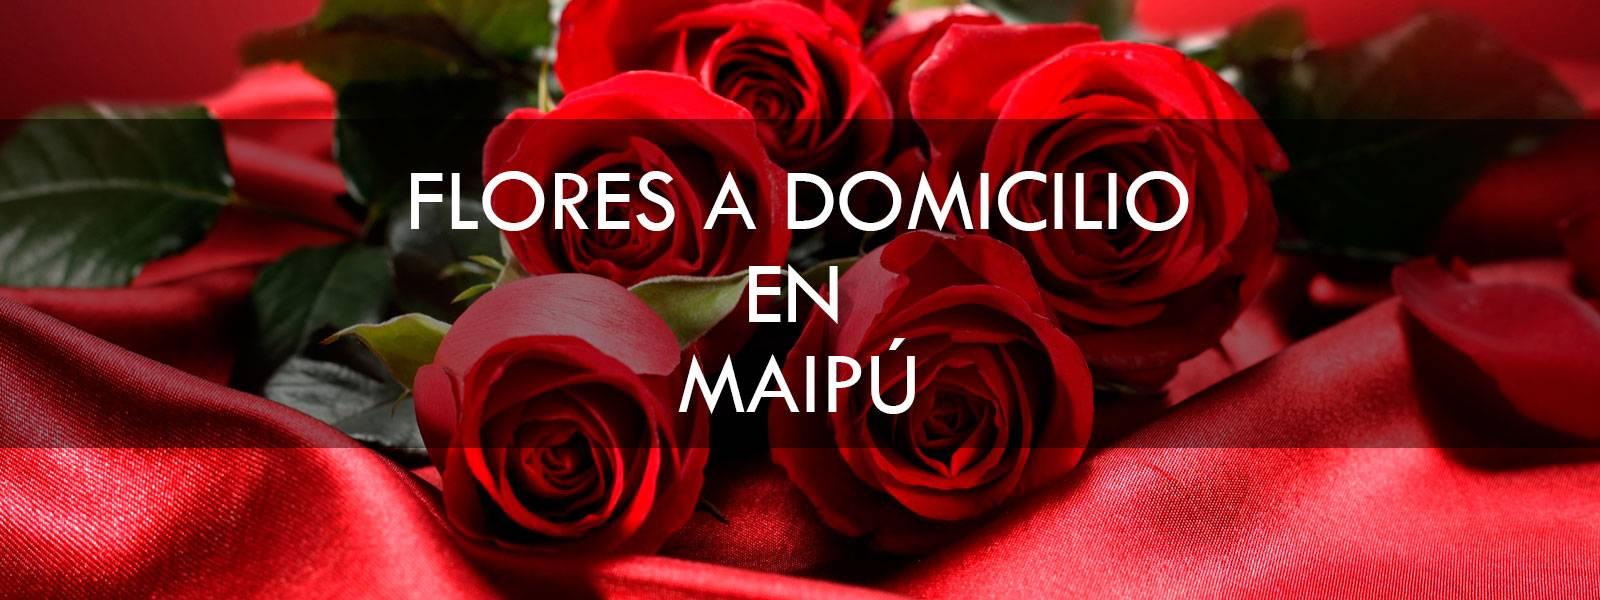 Flores a domicilio en Maipú